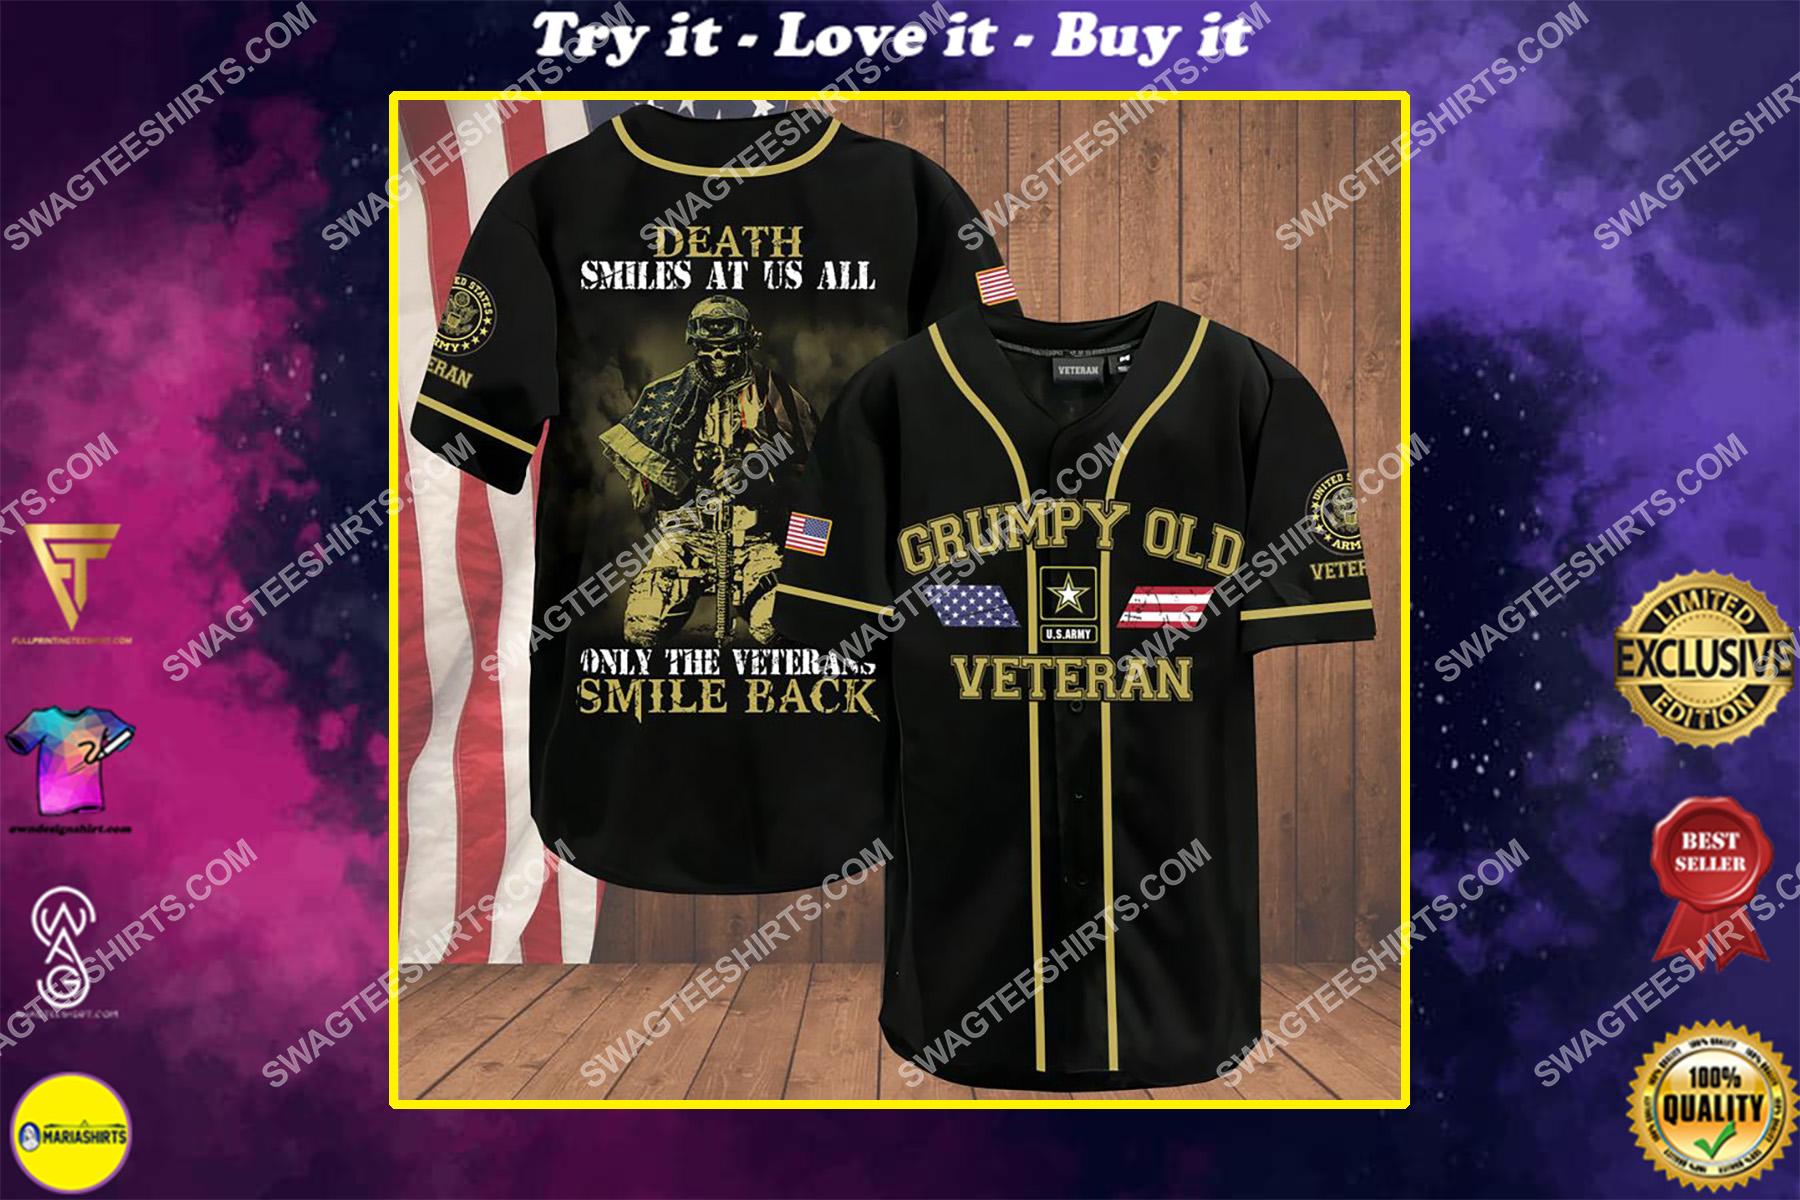 death smiles at us all only the veterans smile back grumpy old veteran army veteran baseball shirt